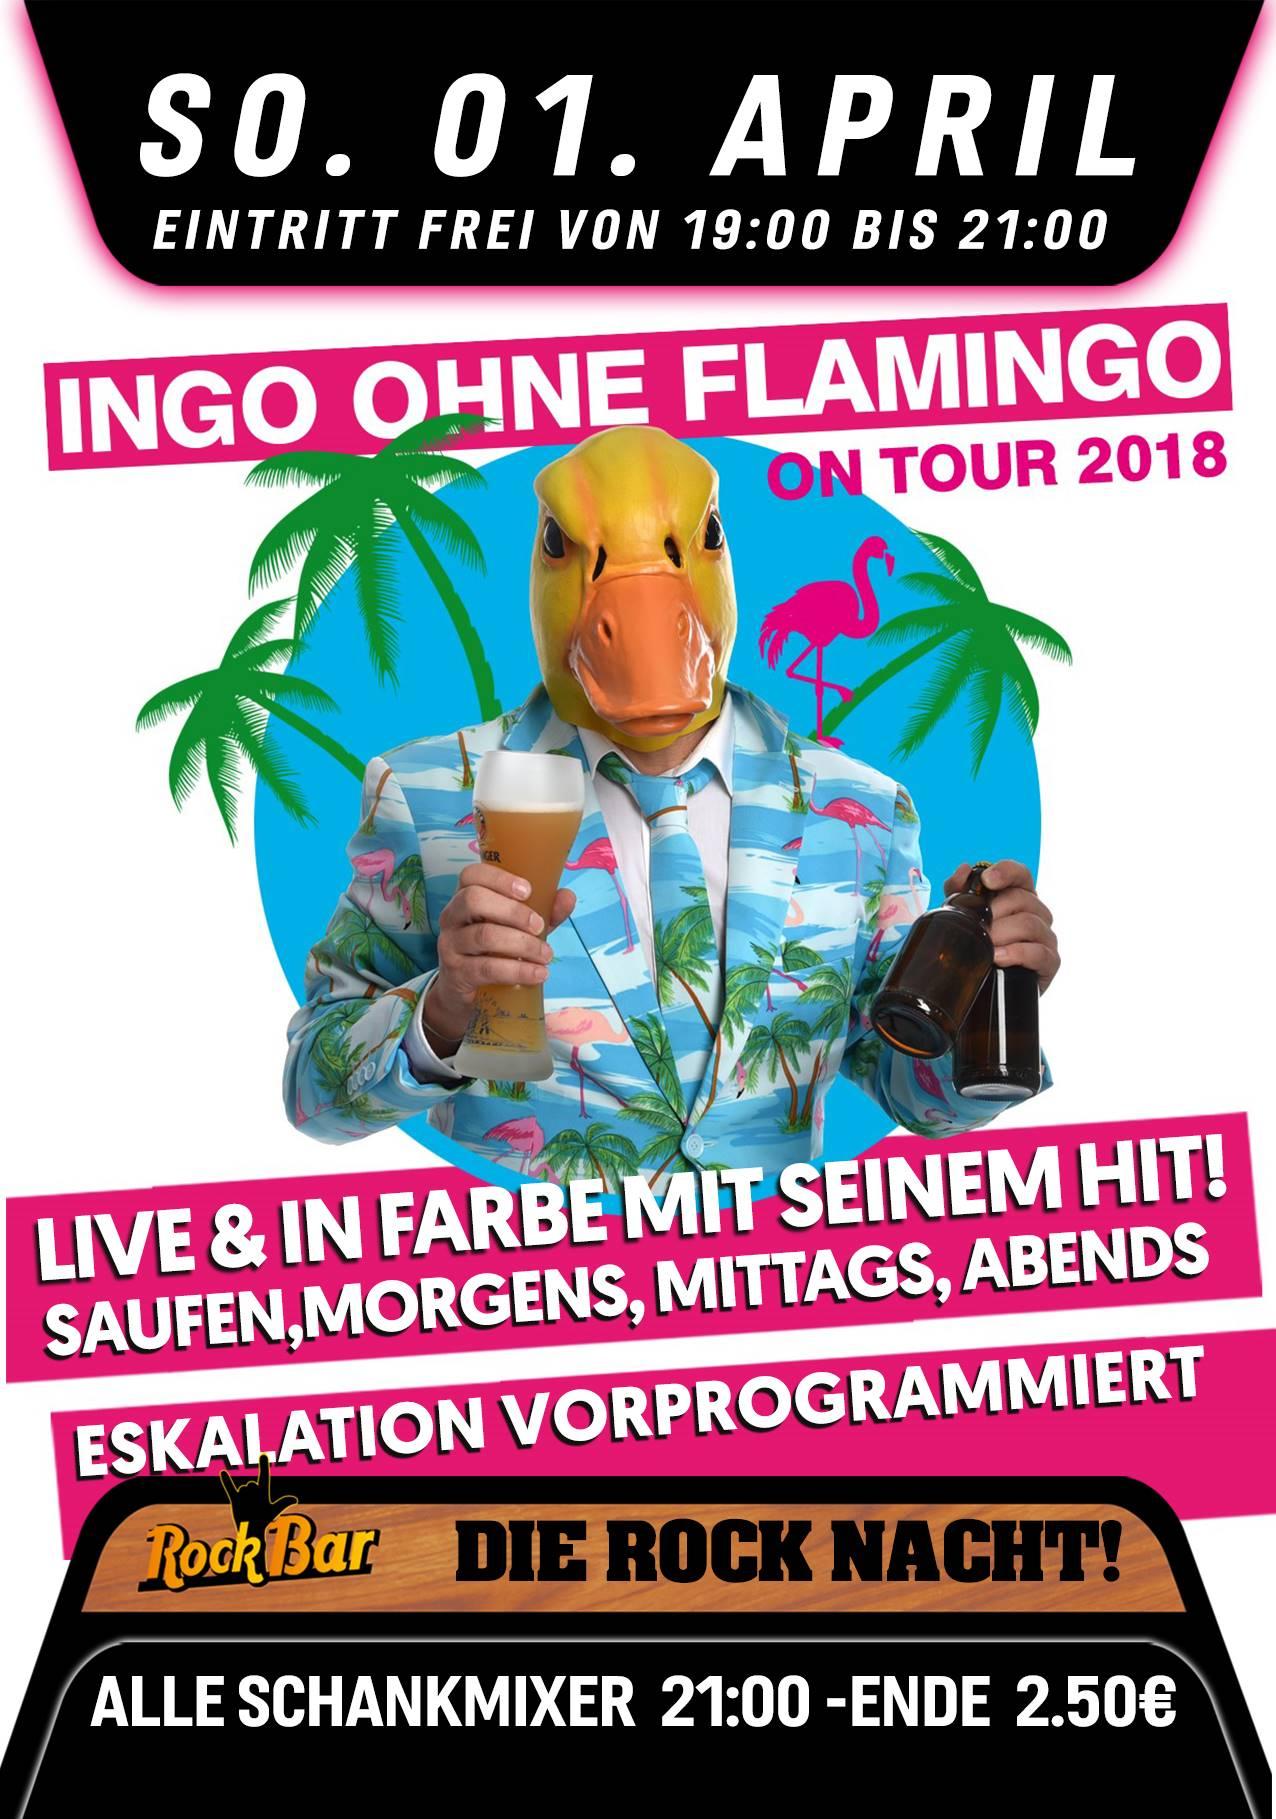 Ingo ohne Flamingo Live!